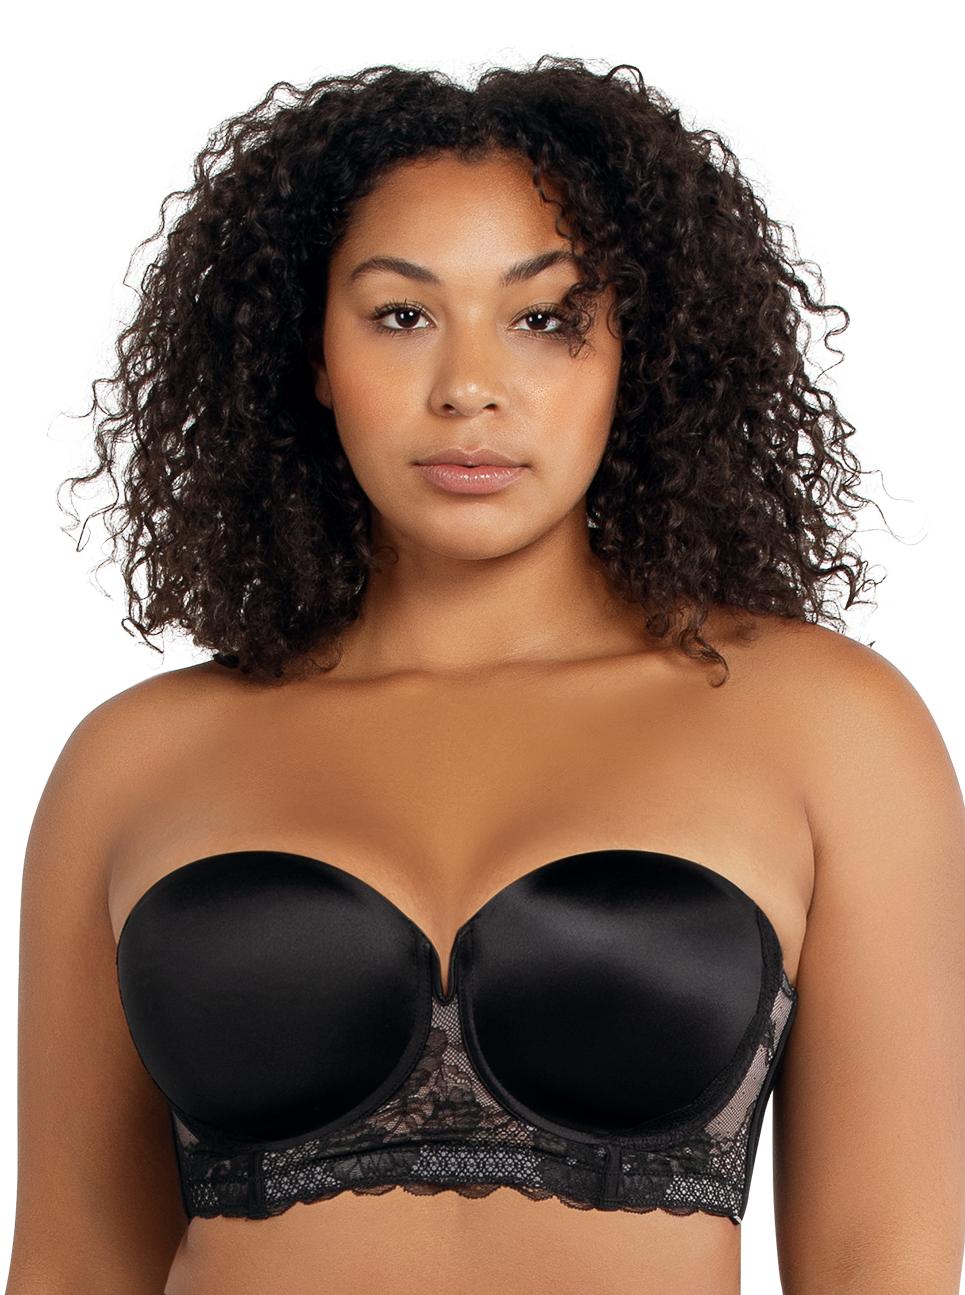 PARFAIT Amber StraplessBraA16812 Black Front - Amber Strapless Bra Black A16812